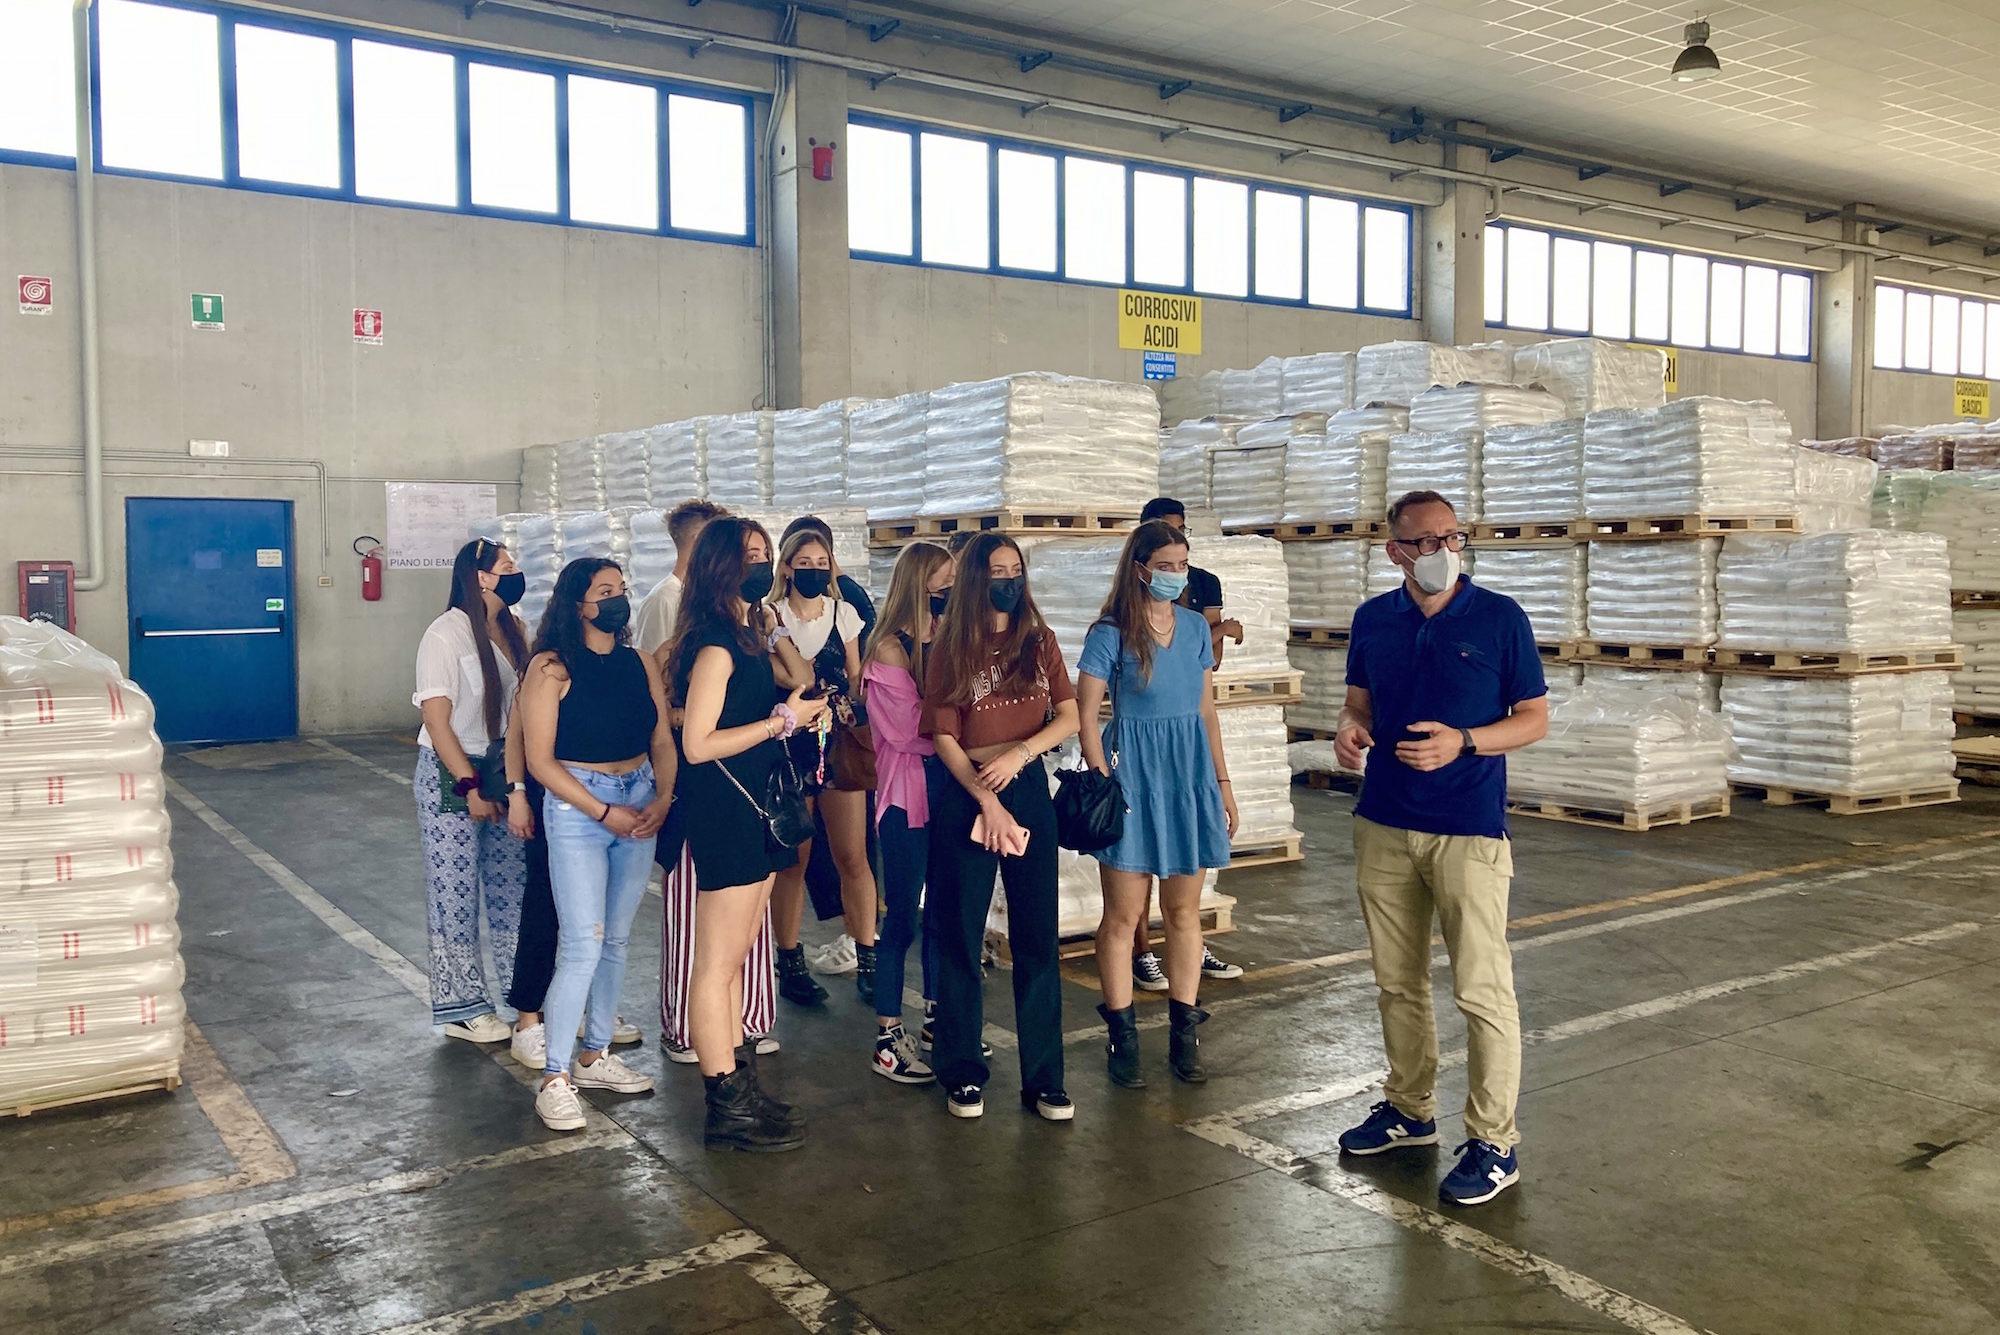 toscolapi visita MITA Academy